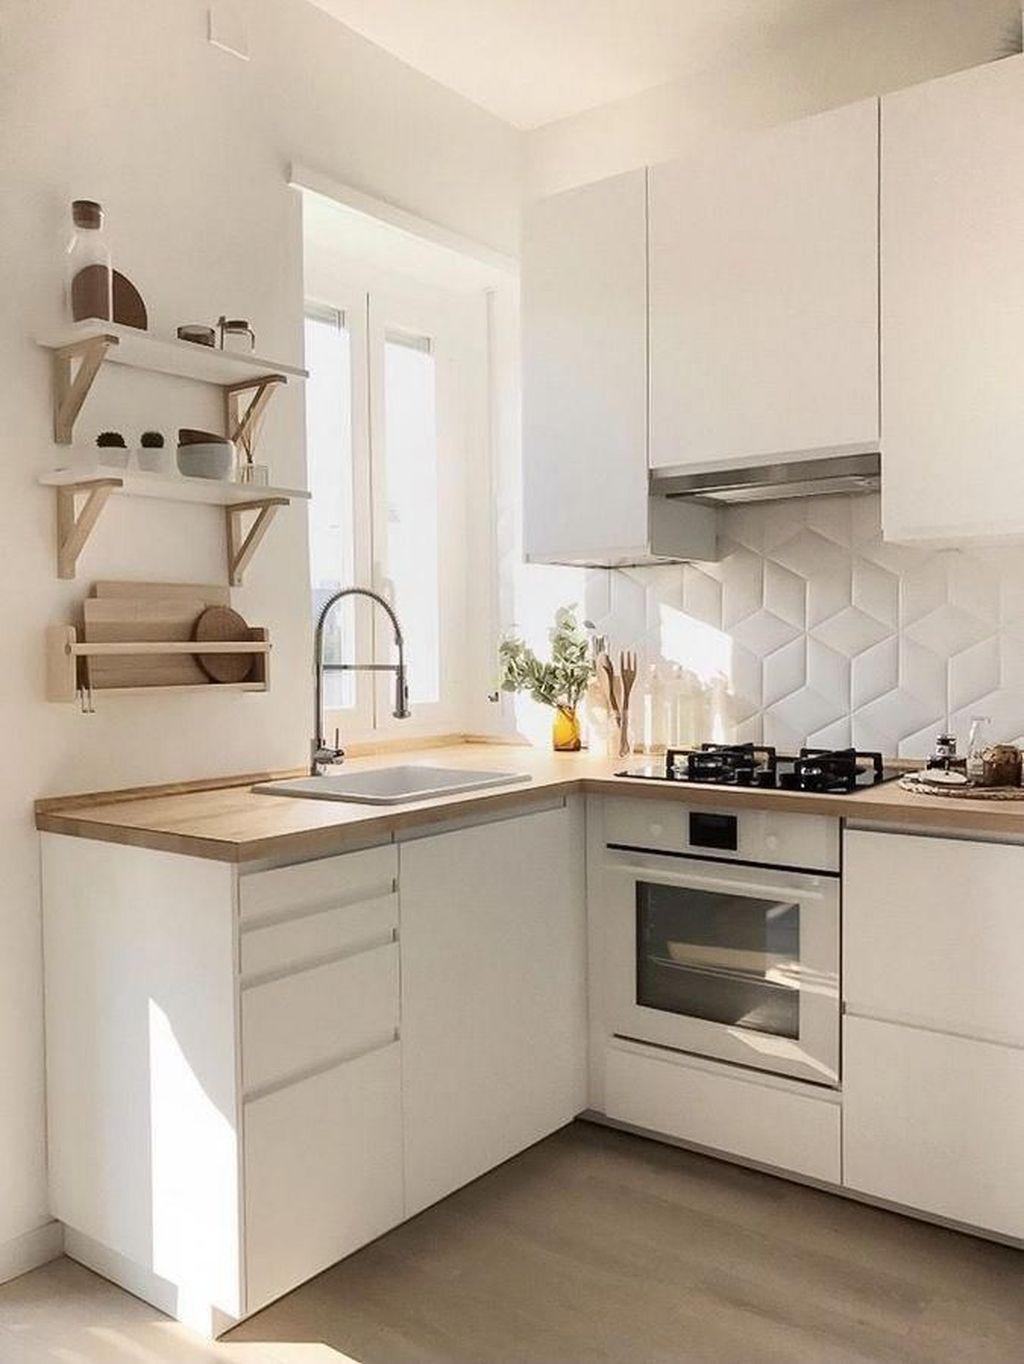 Popular Apartment Kitchen Design Ideas You Should Copy 04